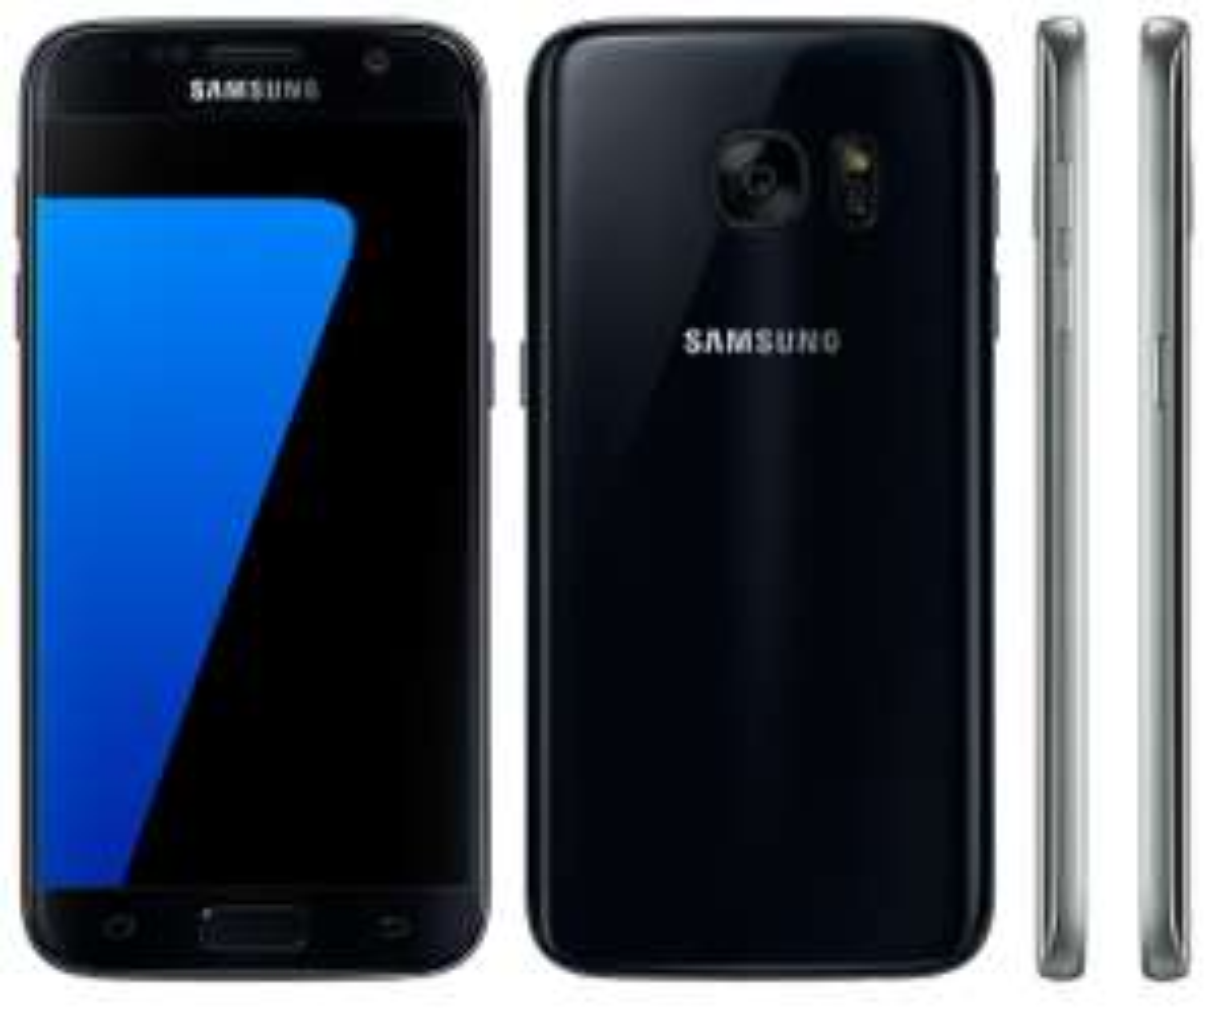 "Smartphone 5.1"" Samsung Galaxy S7 Noir - Amoled 1440 x 2560, Exynos 8890 Octo-Core 2,3 Ghz, RAM 4Go, 32Go"